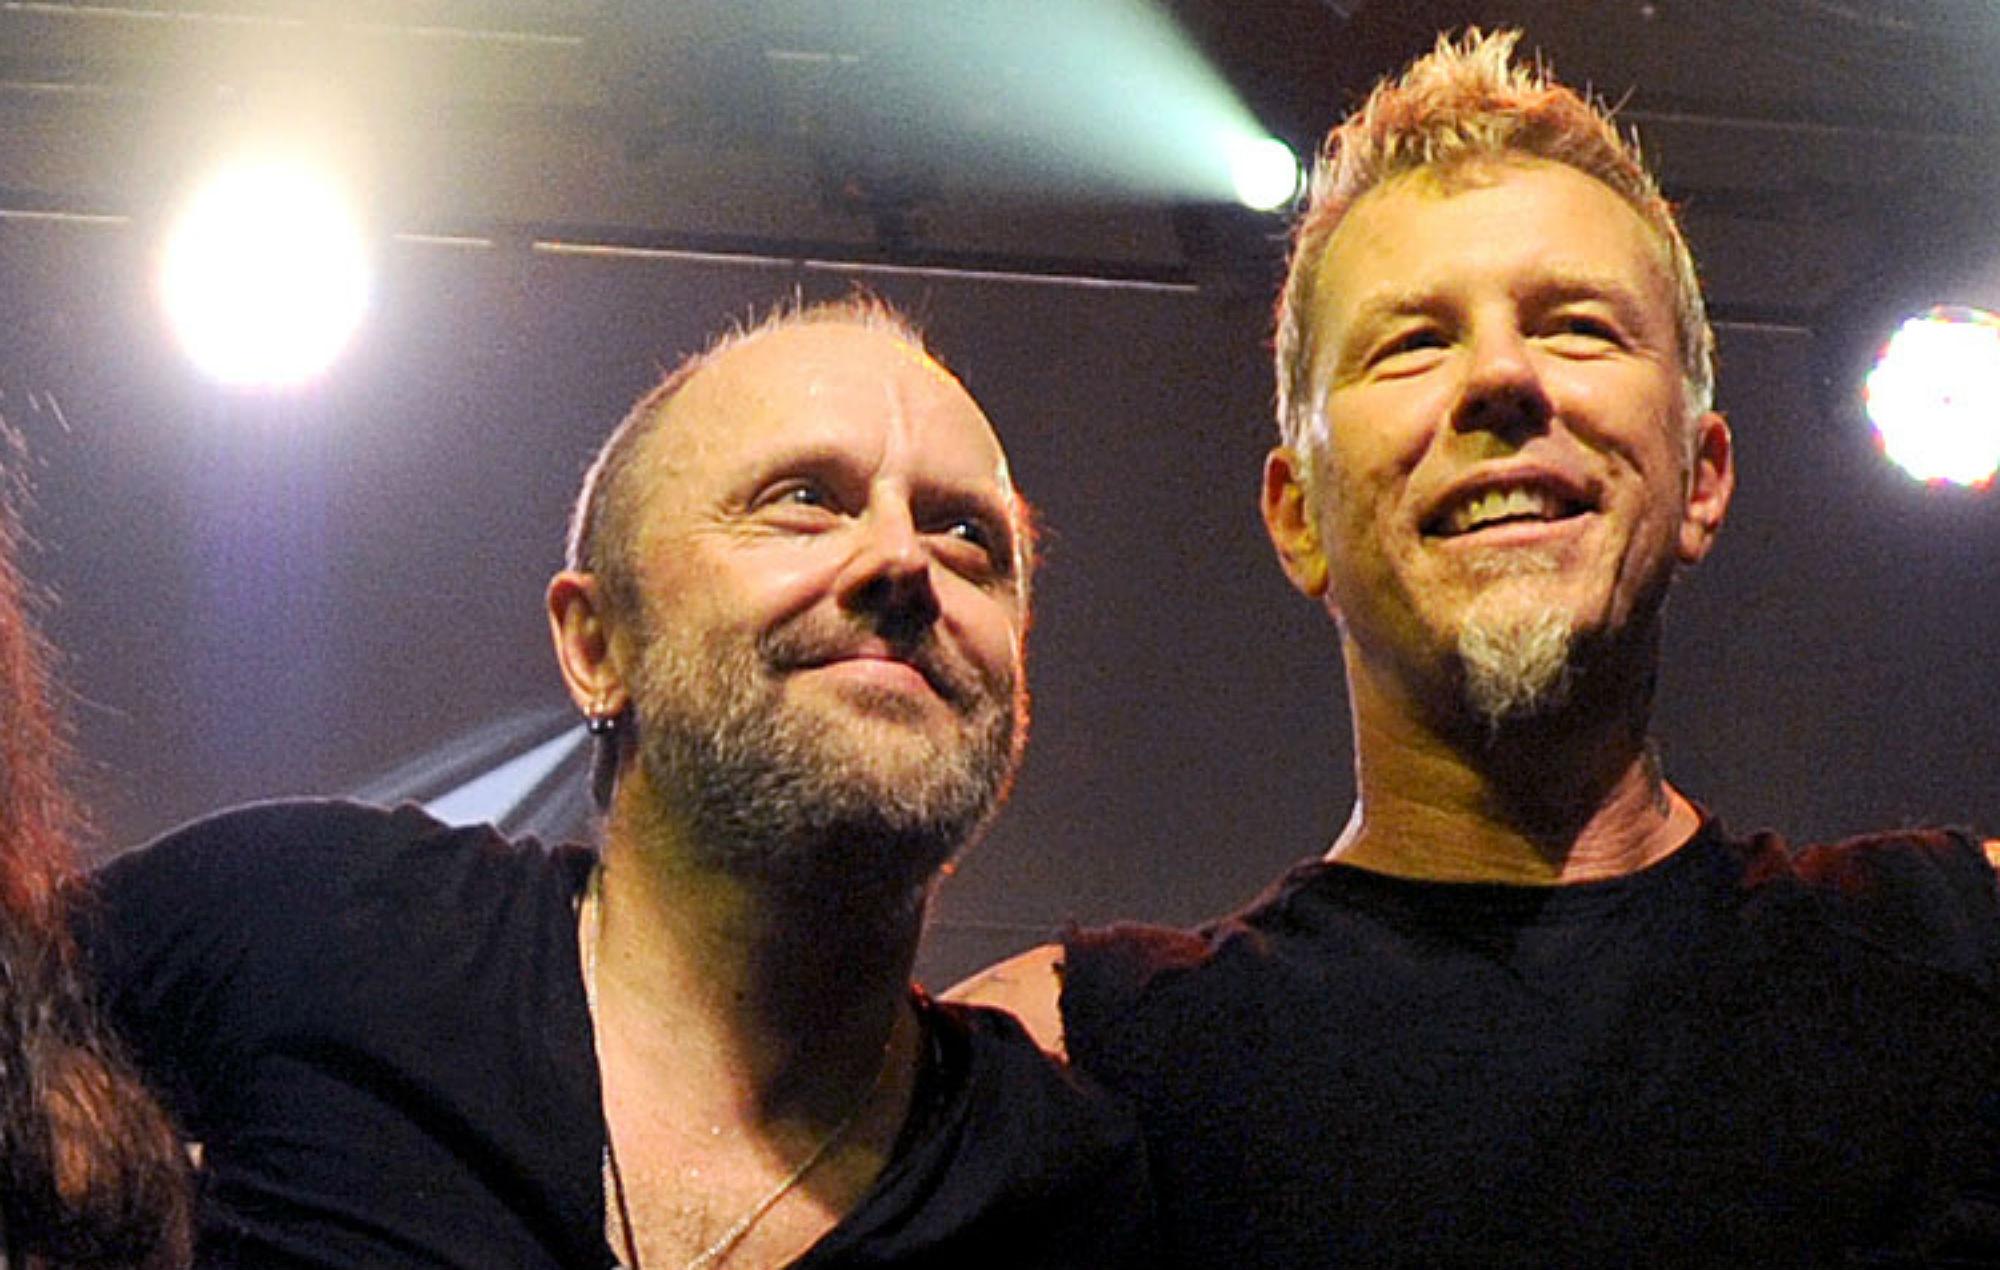 #Metallica, #Lars Ulrich, #James Hetfield, #long hair, #